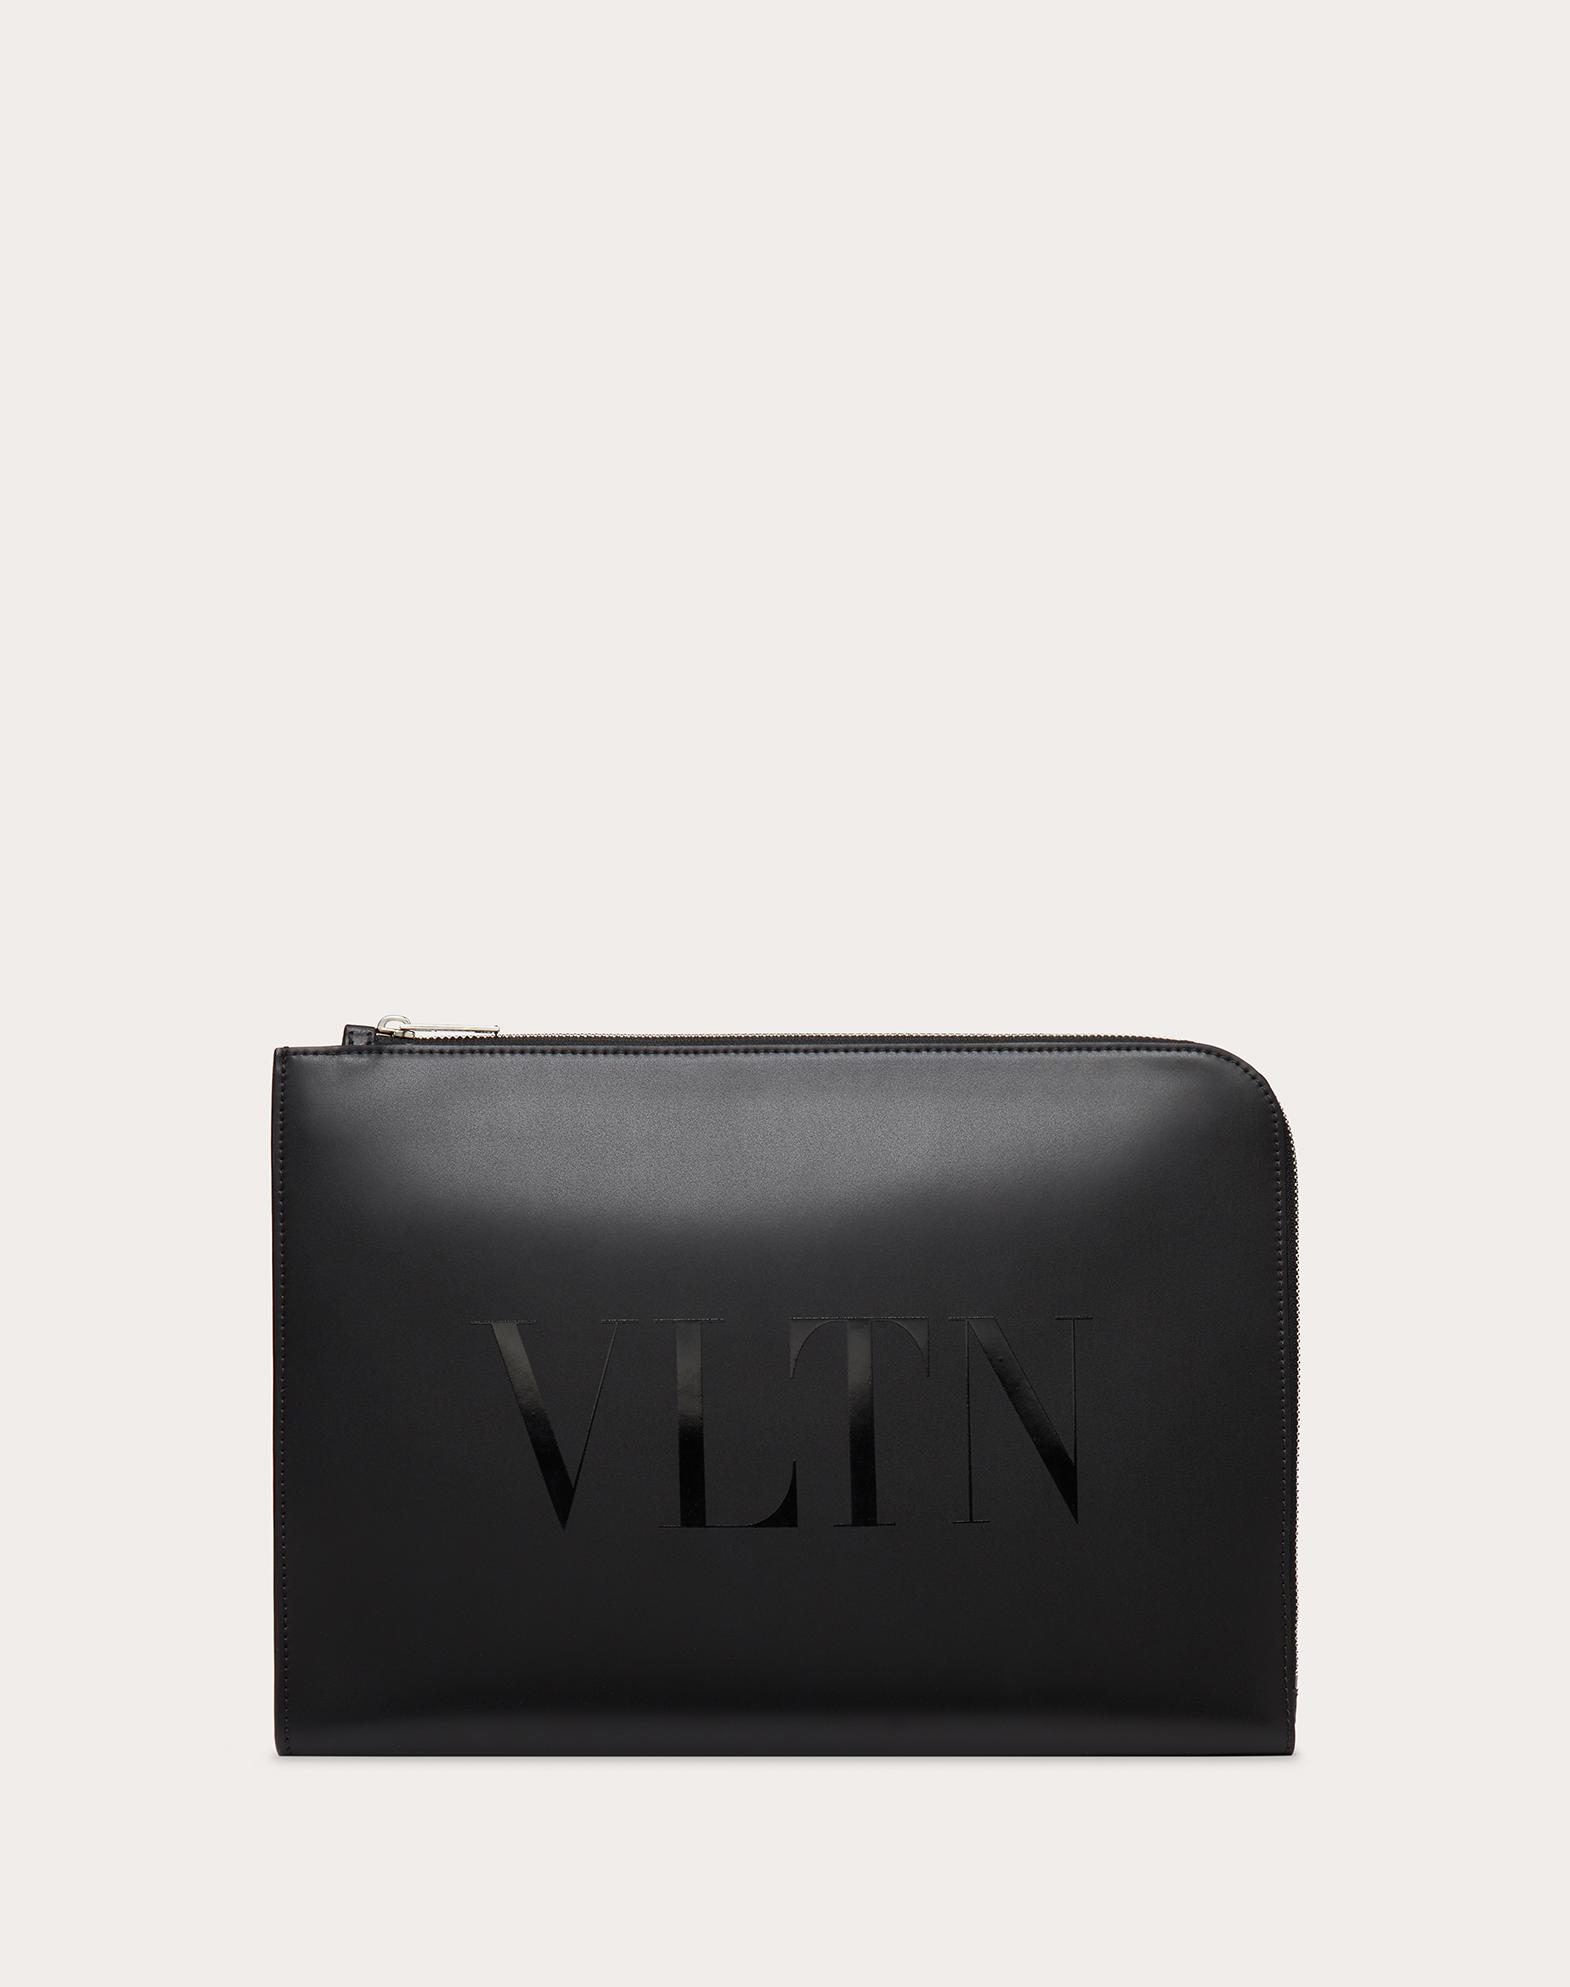 VLTN Leather Briefcase